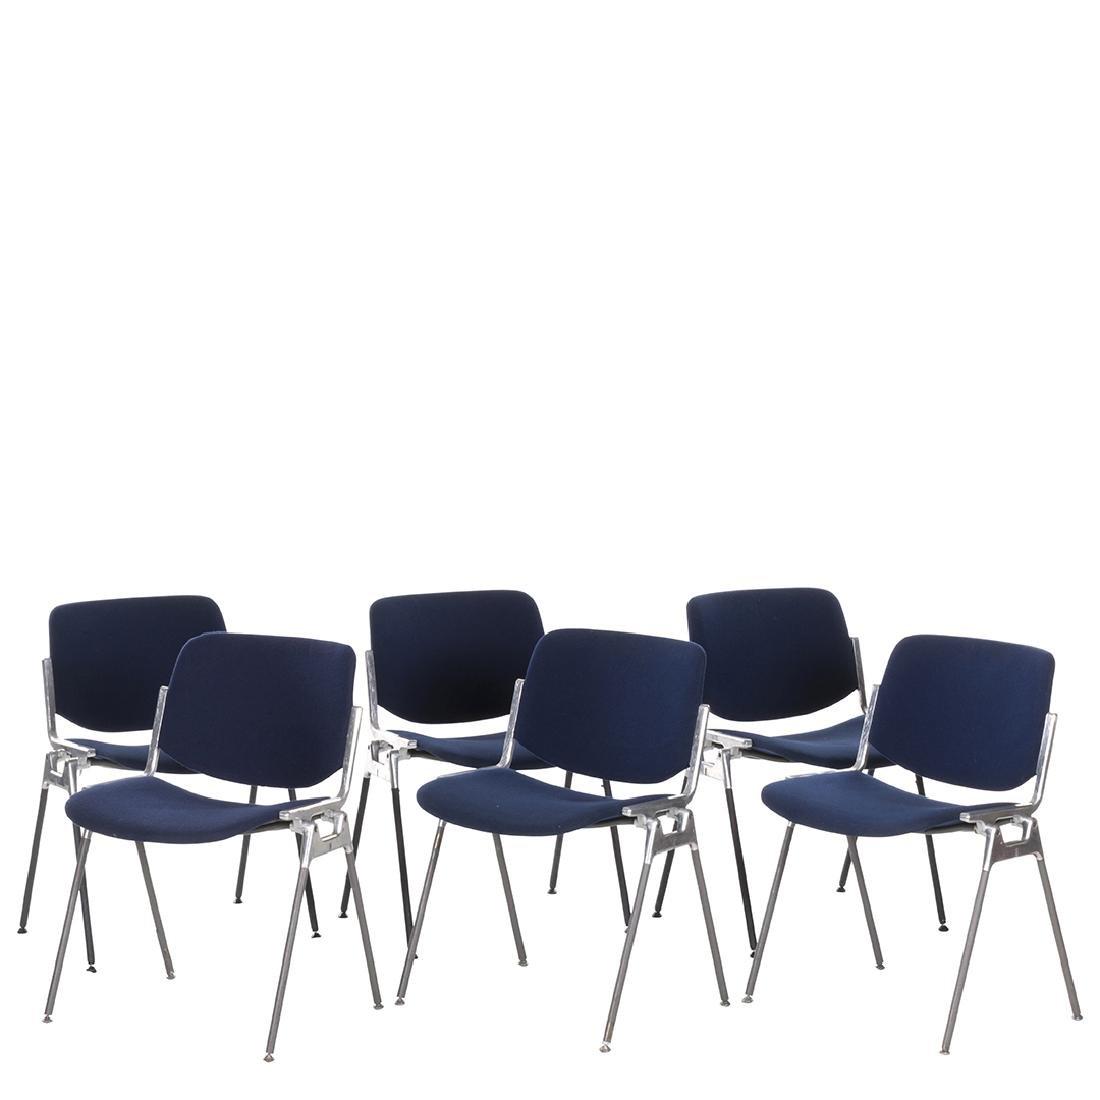 Giancarlo Piretti Chairs (12) - 2